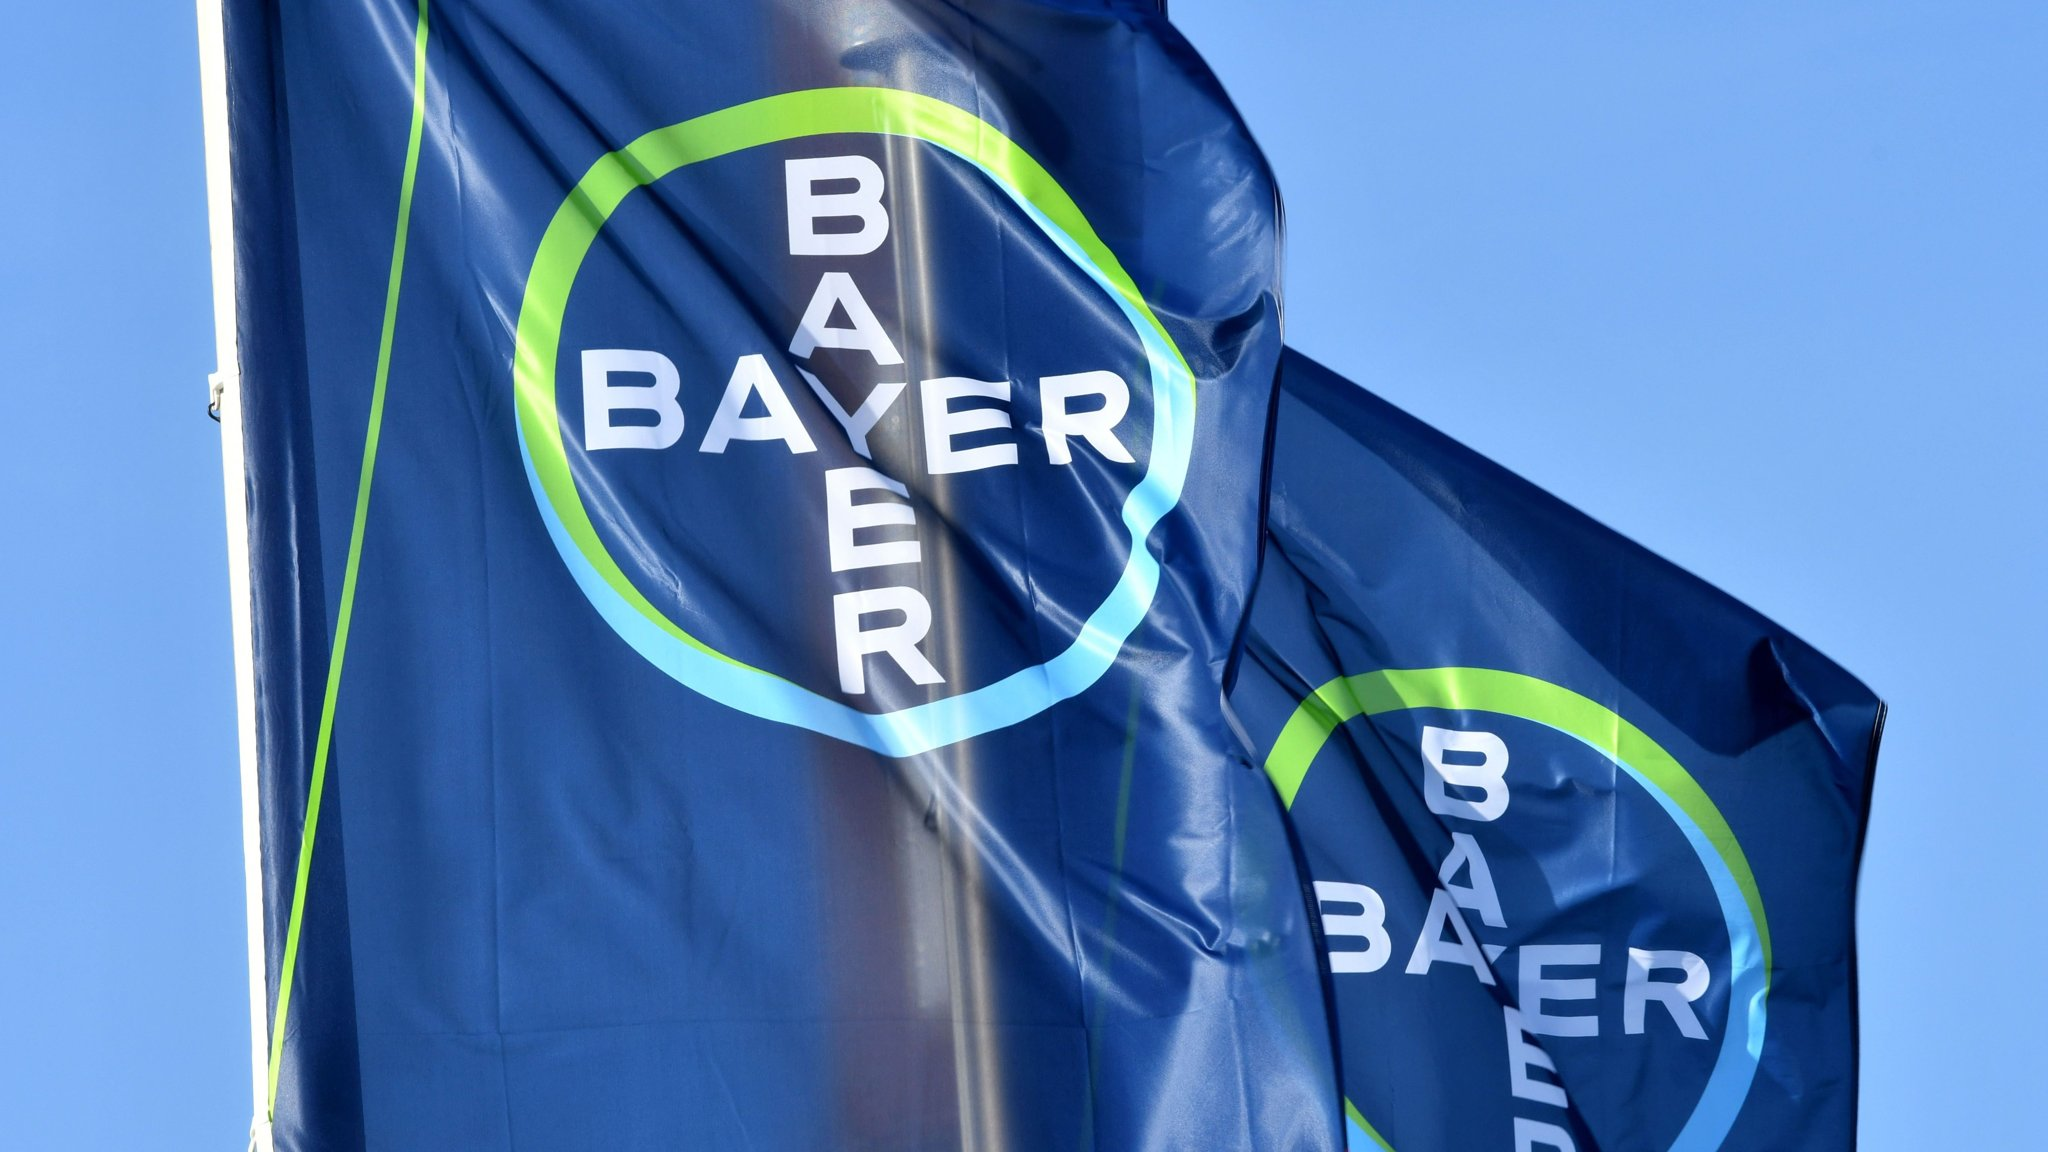 Bayer warns of lower earnings on Monsanto deal delays